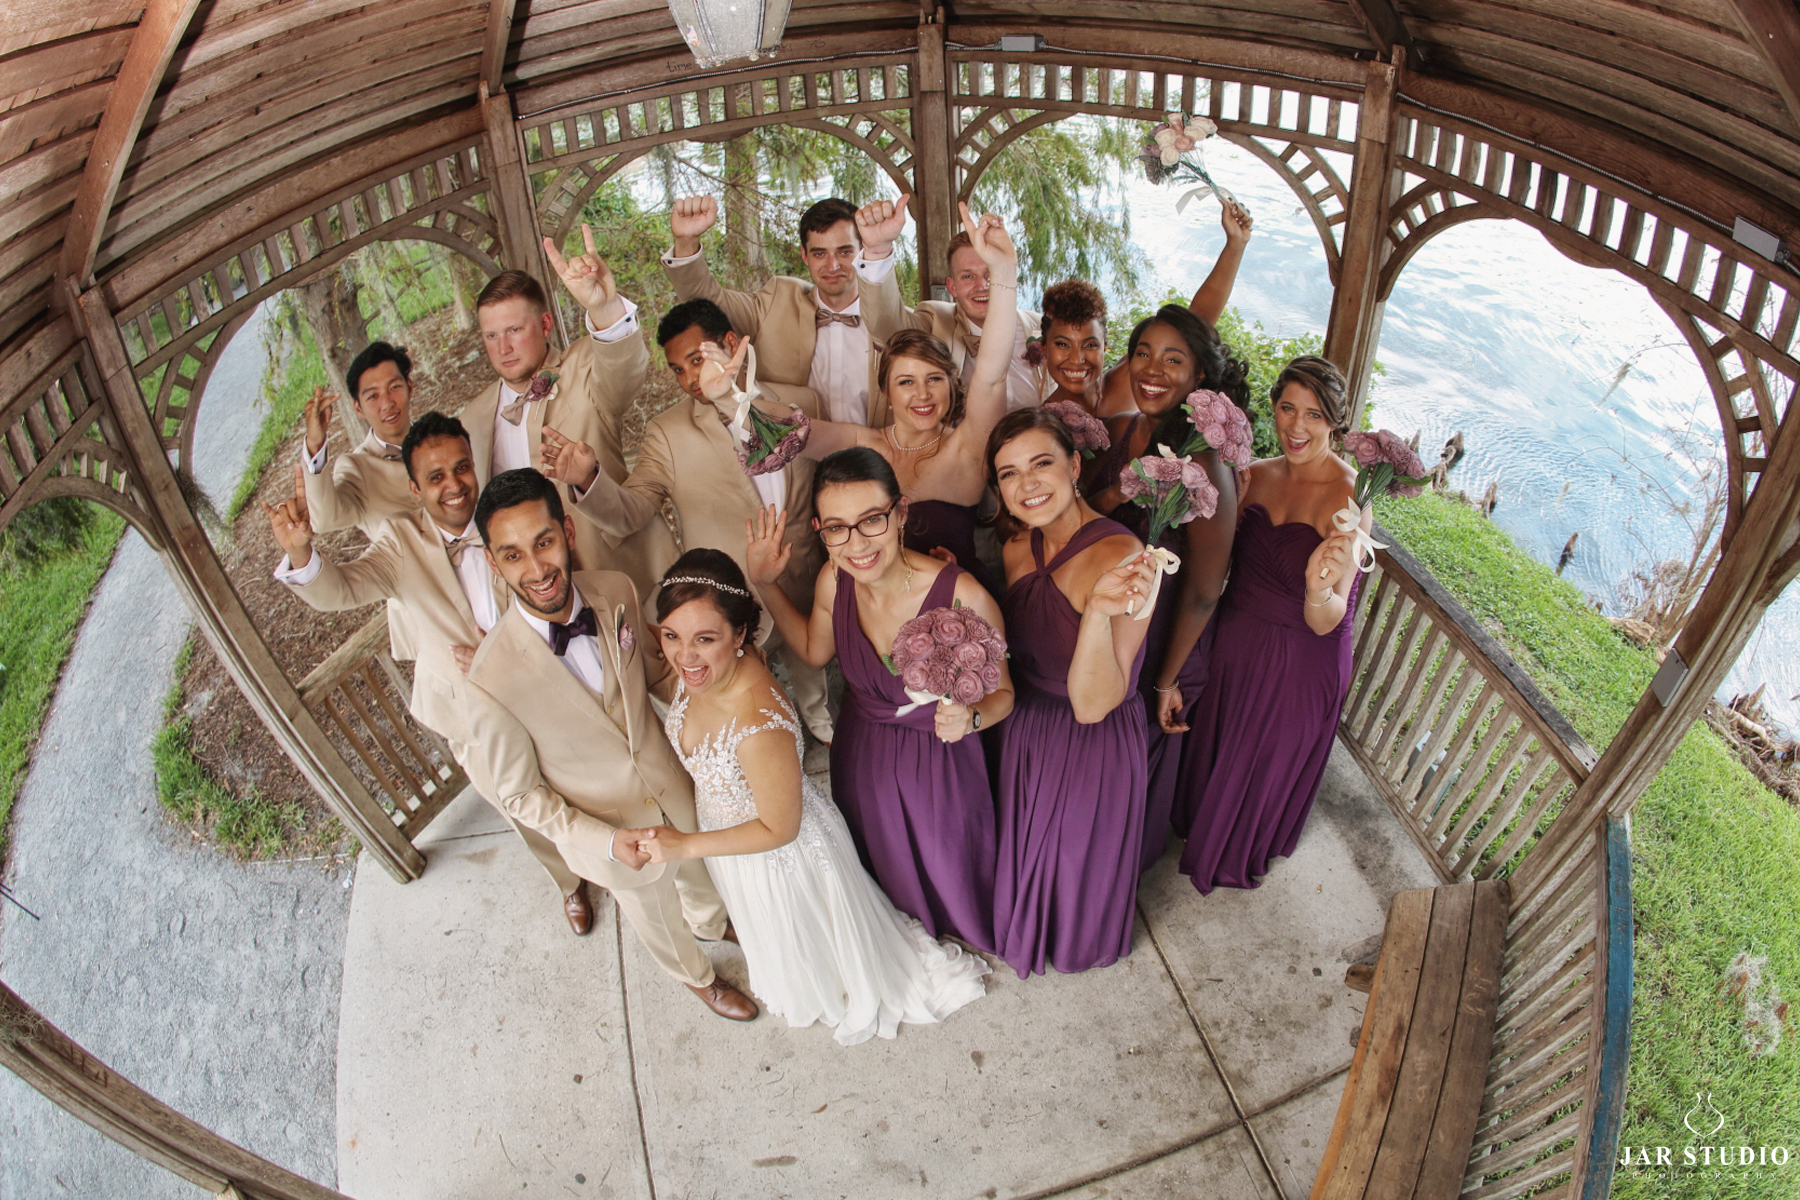 sorority-fraternity-ideas-rollins-jarstudio-wedding-photographer-323.JPG